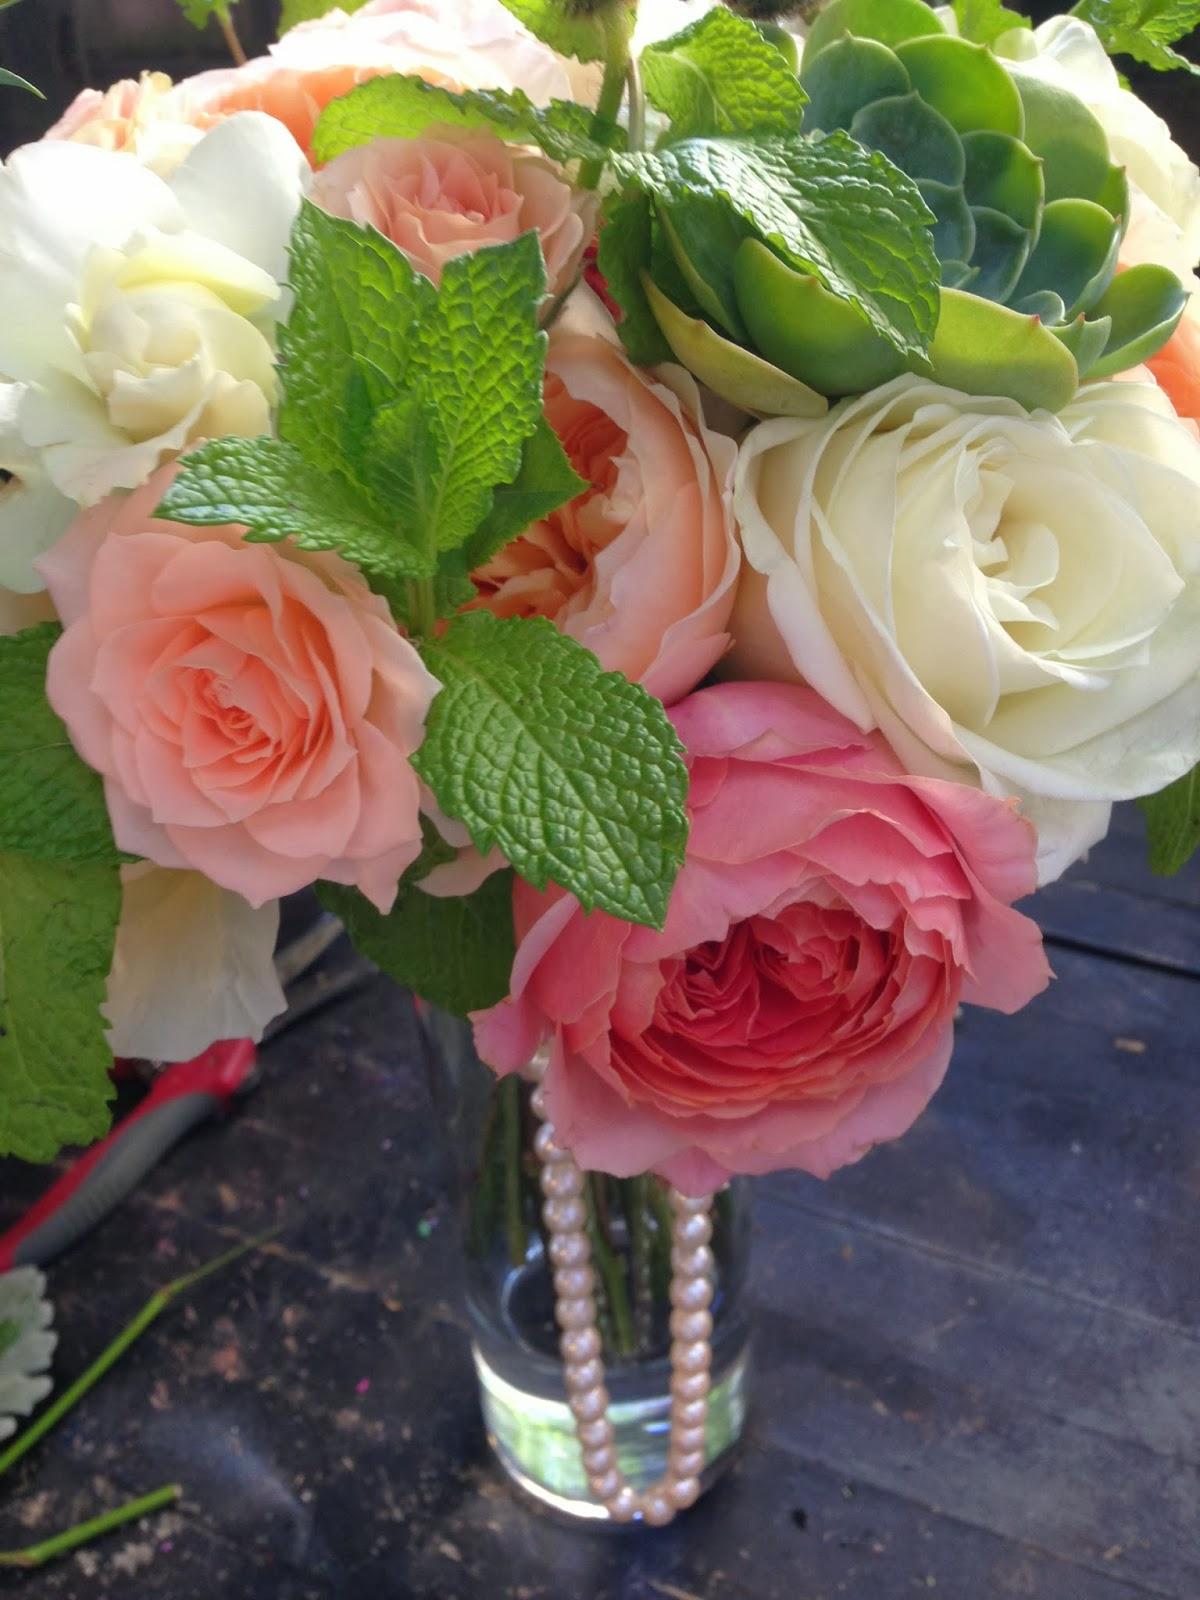 Coral Garden Rose pico soriano designs: peach and coral garden rose and succulents